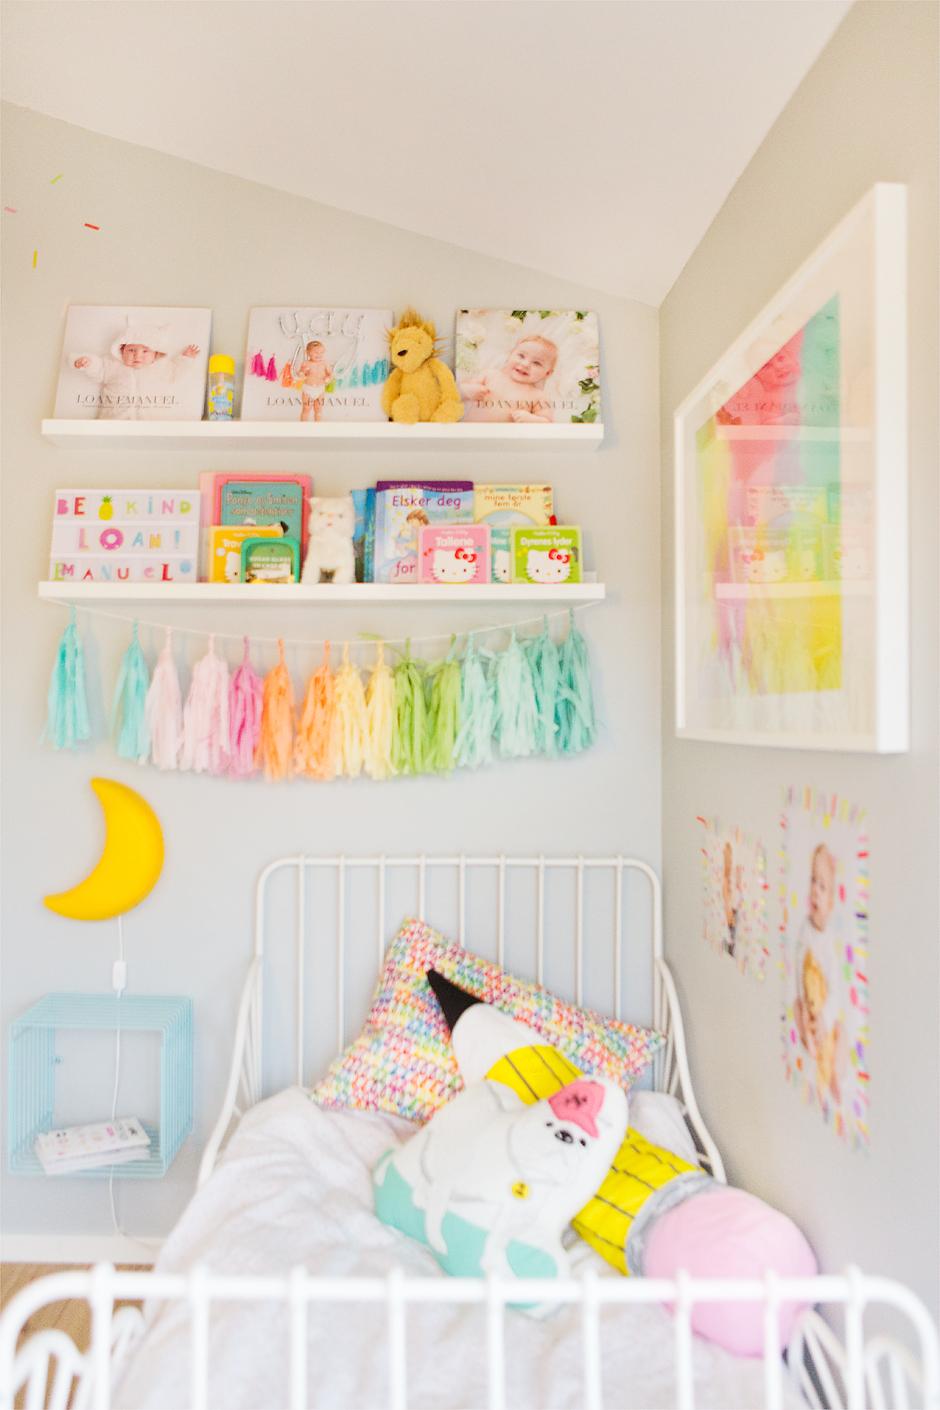 interiør-barnerom-blogg-kidsroom-pastell-fargerikt-haslien-foto-inspirasjon-unisex-barneinteriør_10